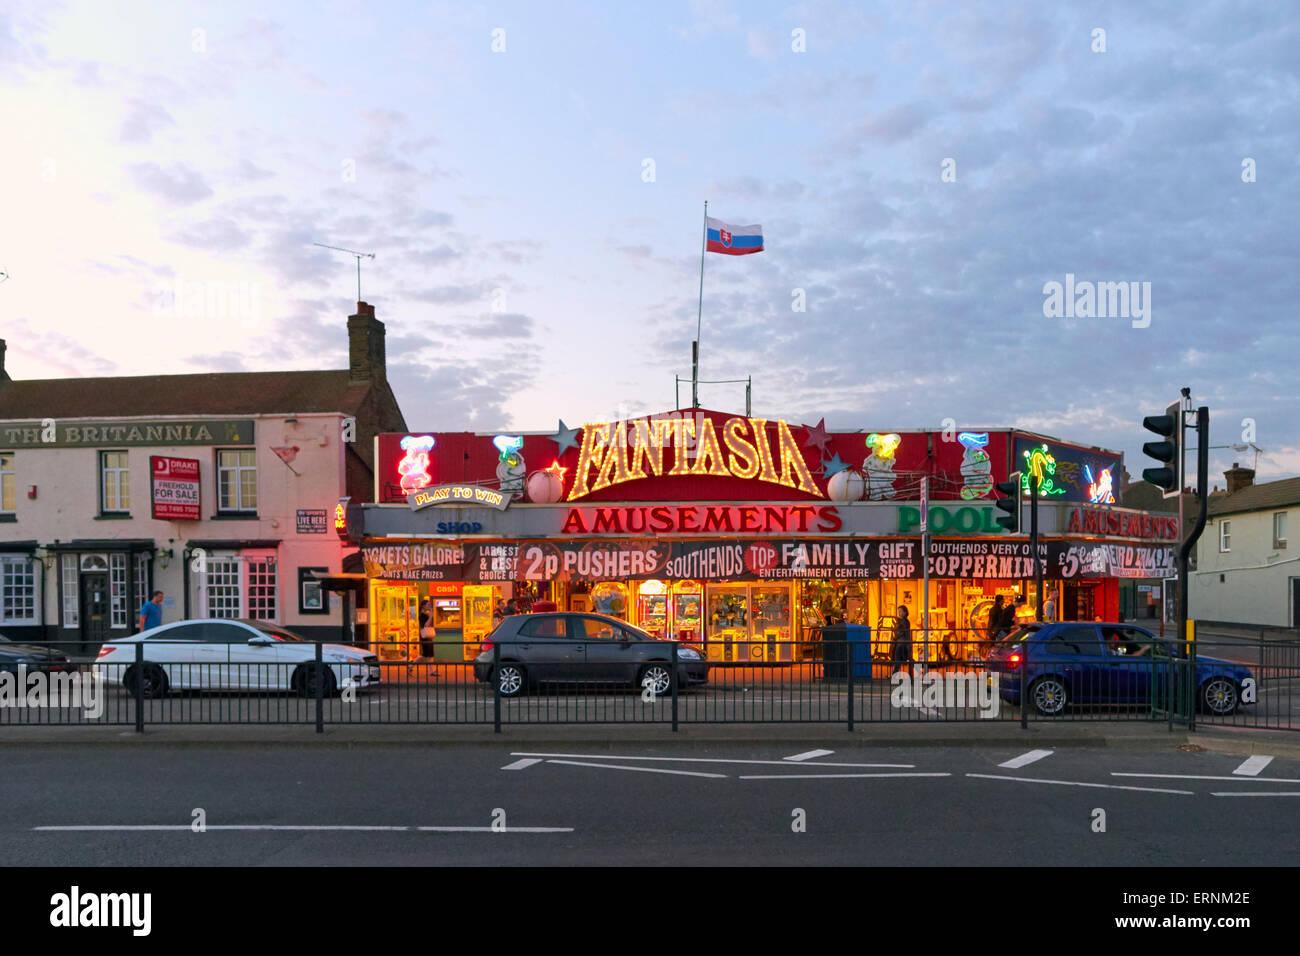 Fantasia Amusements Southend On Sea, Essex - Stock Image